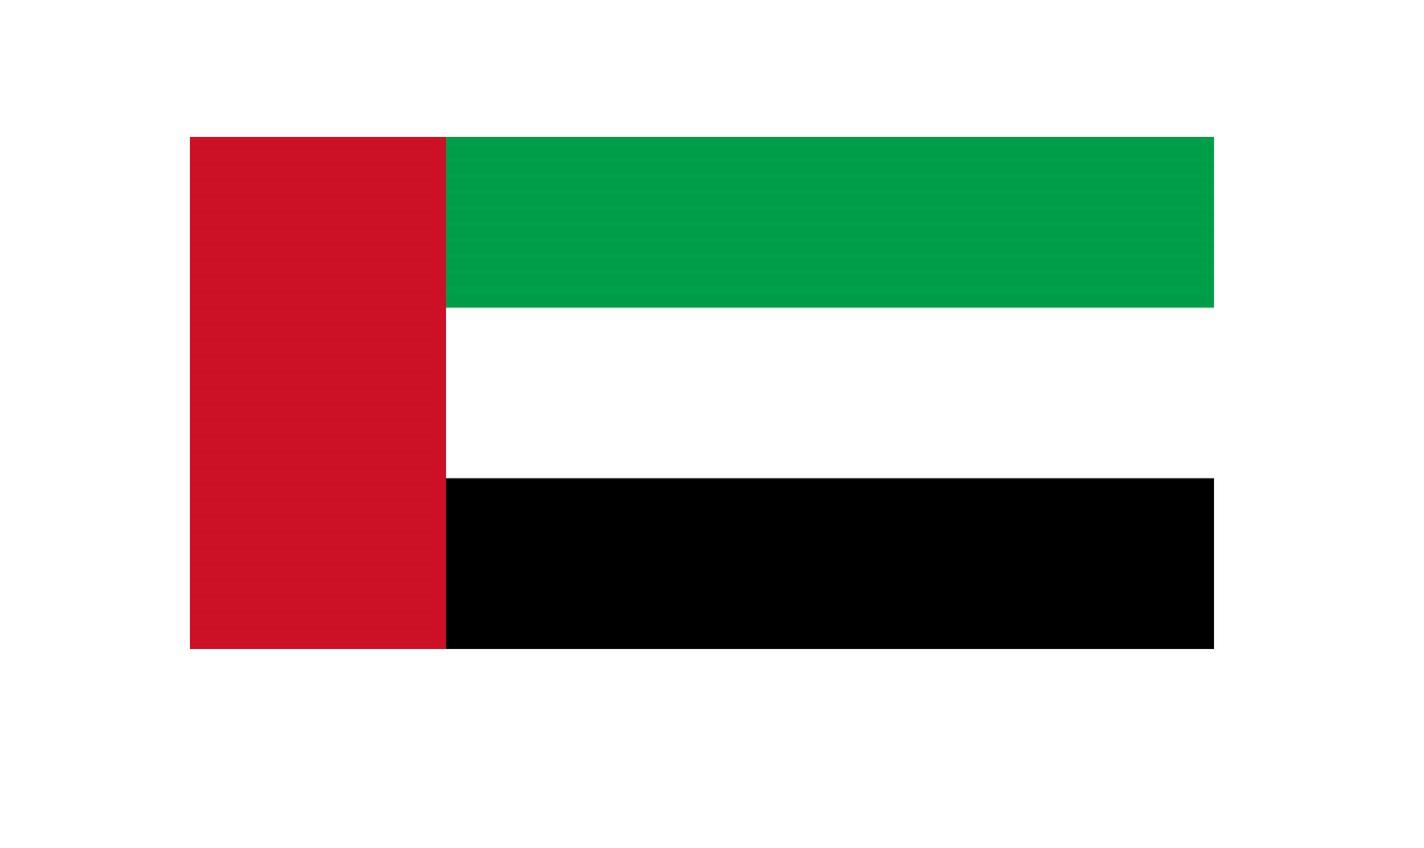 Staff Major-General Mohamed Sultan Al Masayba